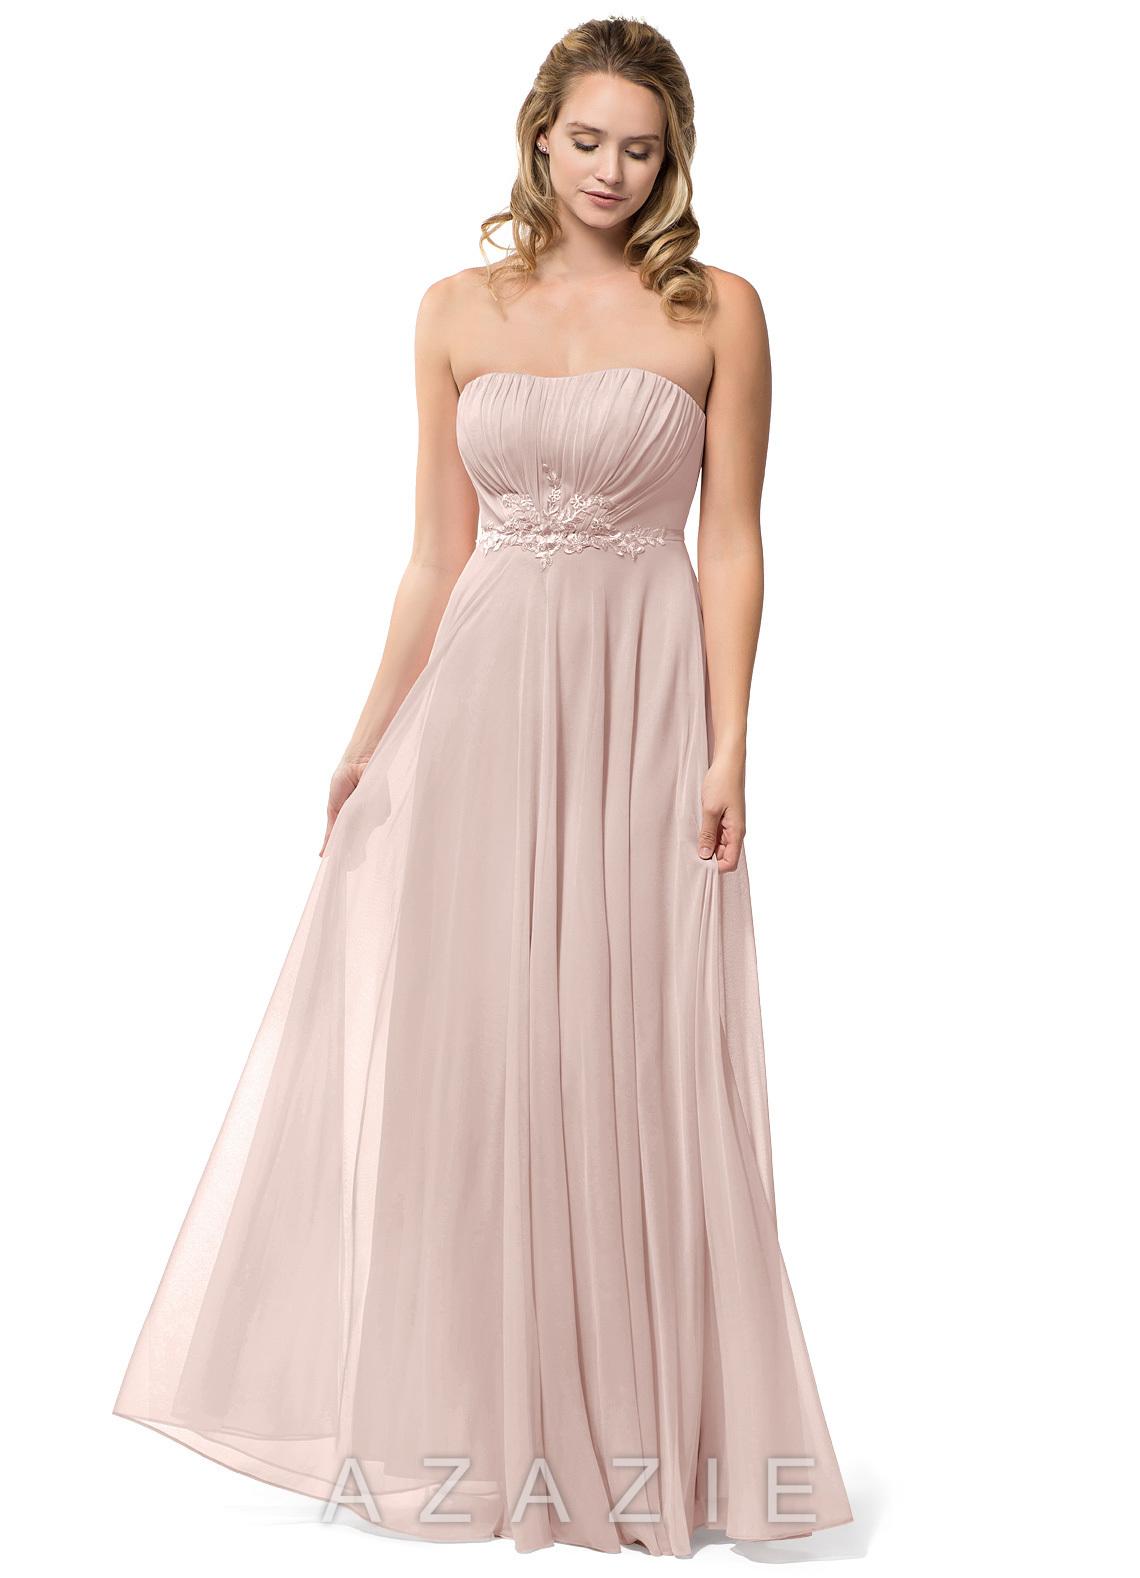 c1dff192e58 Azazie Tara Bridesmaid Dress